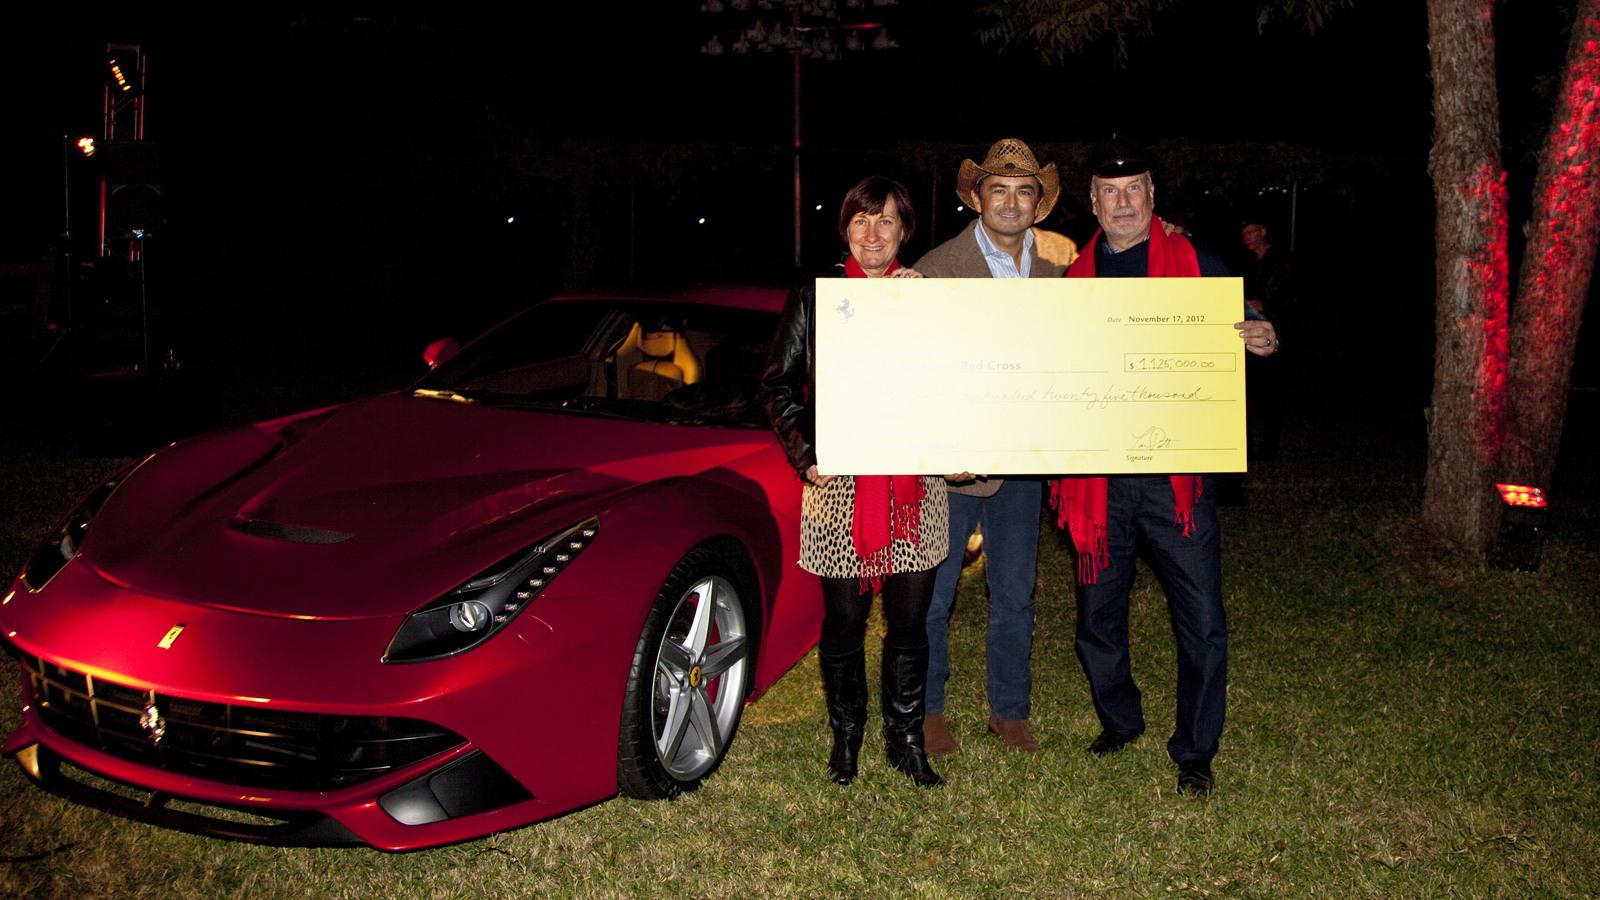 F12 Berlinetta is the highlight at Ferrari event surrounding the 2012 Formula 1 USGP